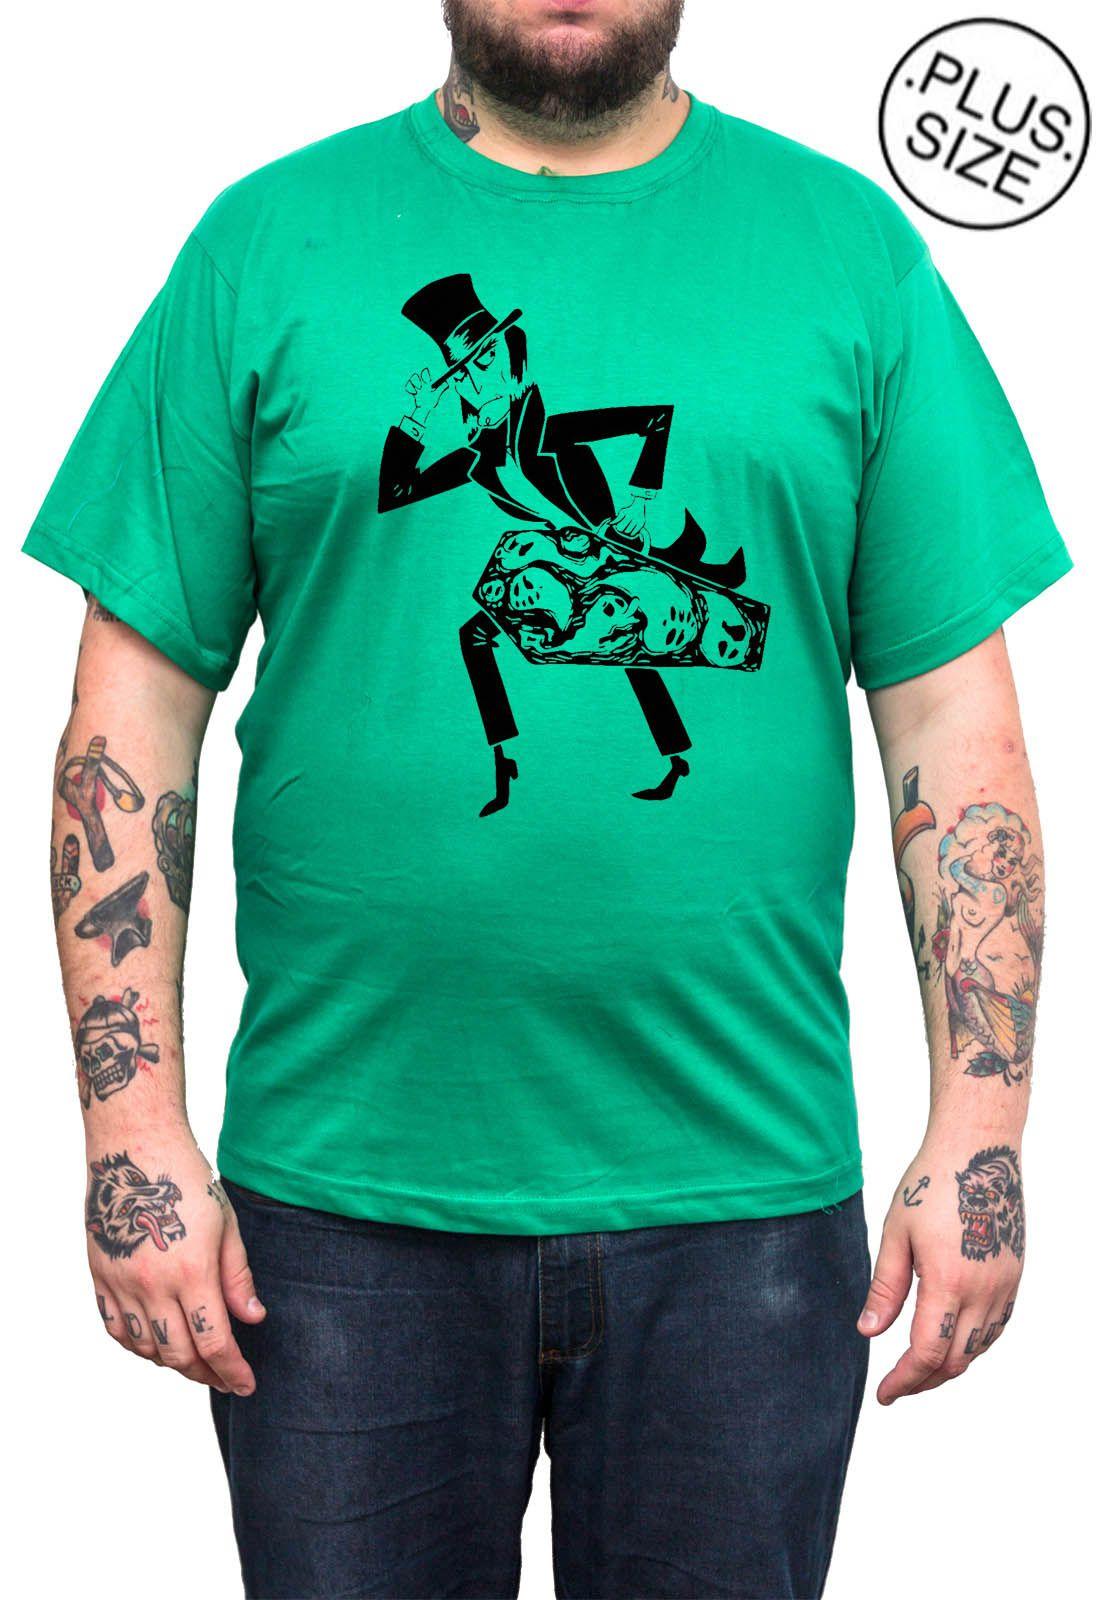 Camiseta Hshop Magic Scape - Verde Bandeira - Plus Size - Tamanho Grande XG  - HShop